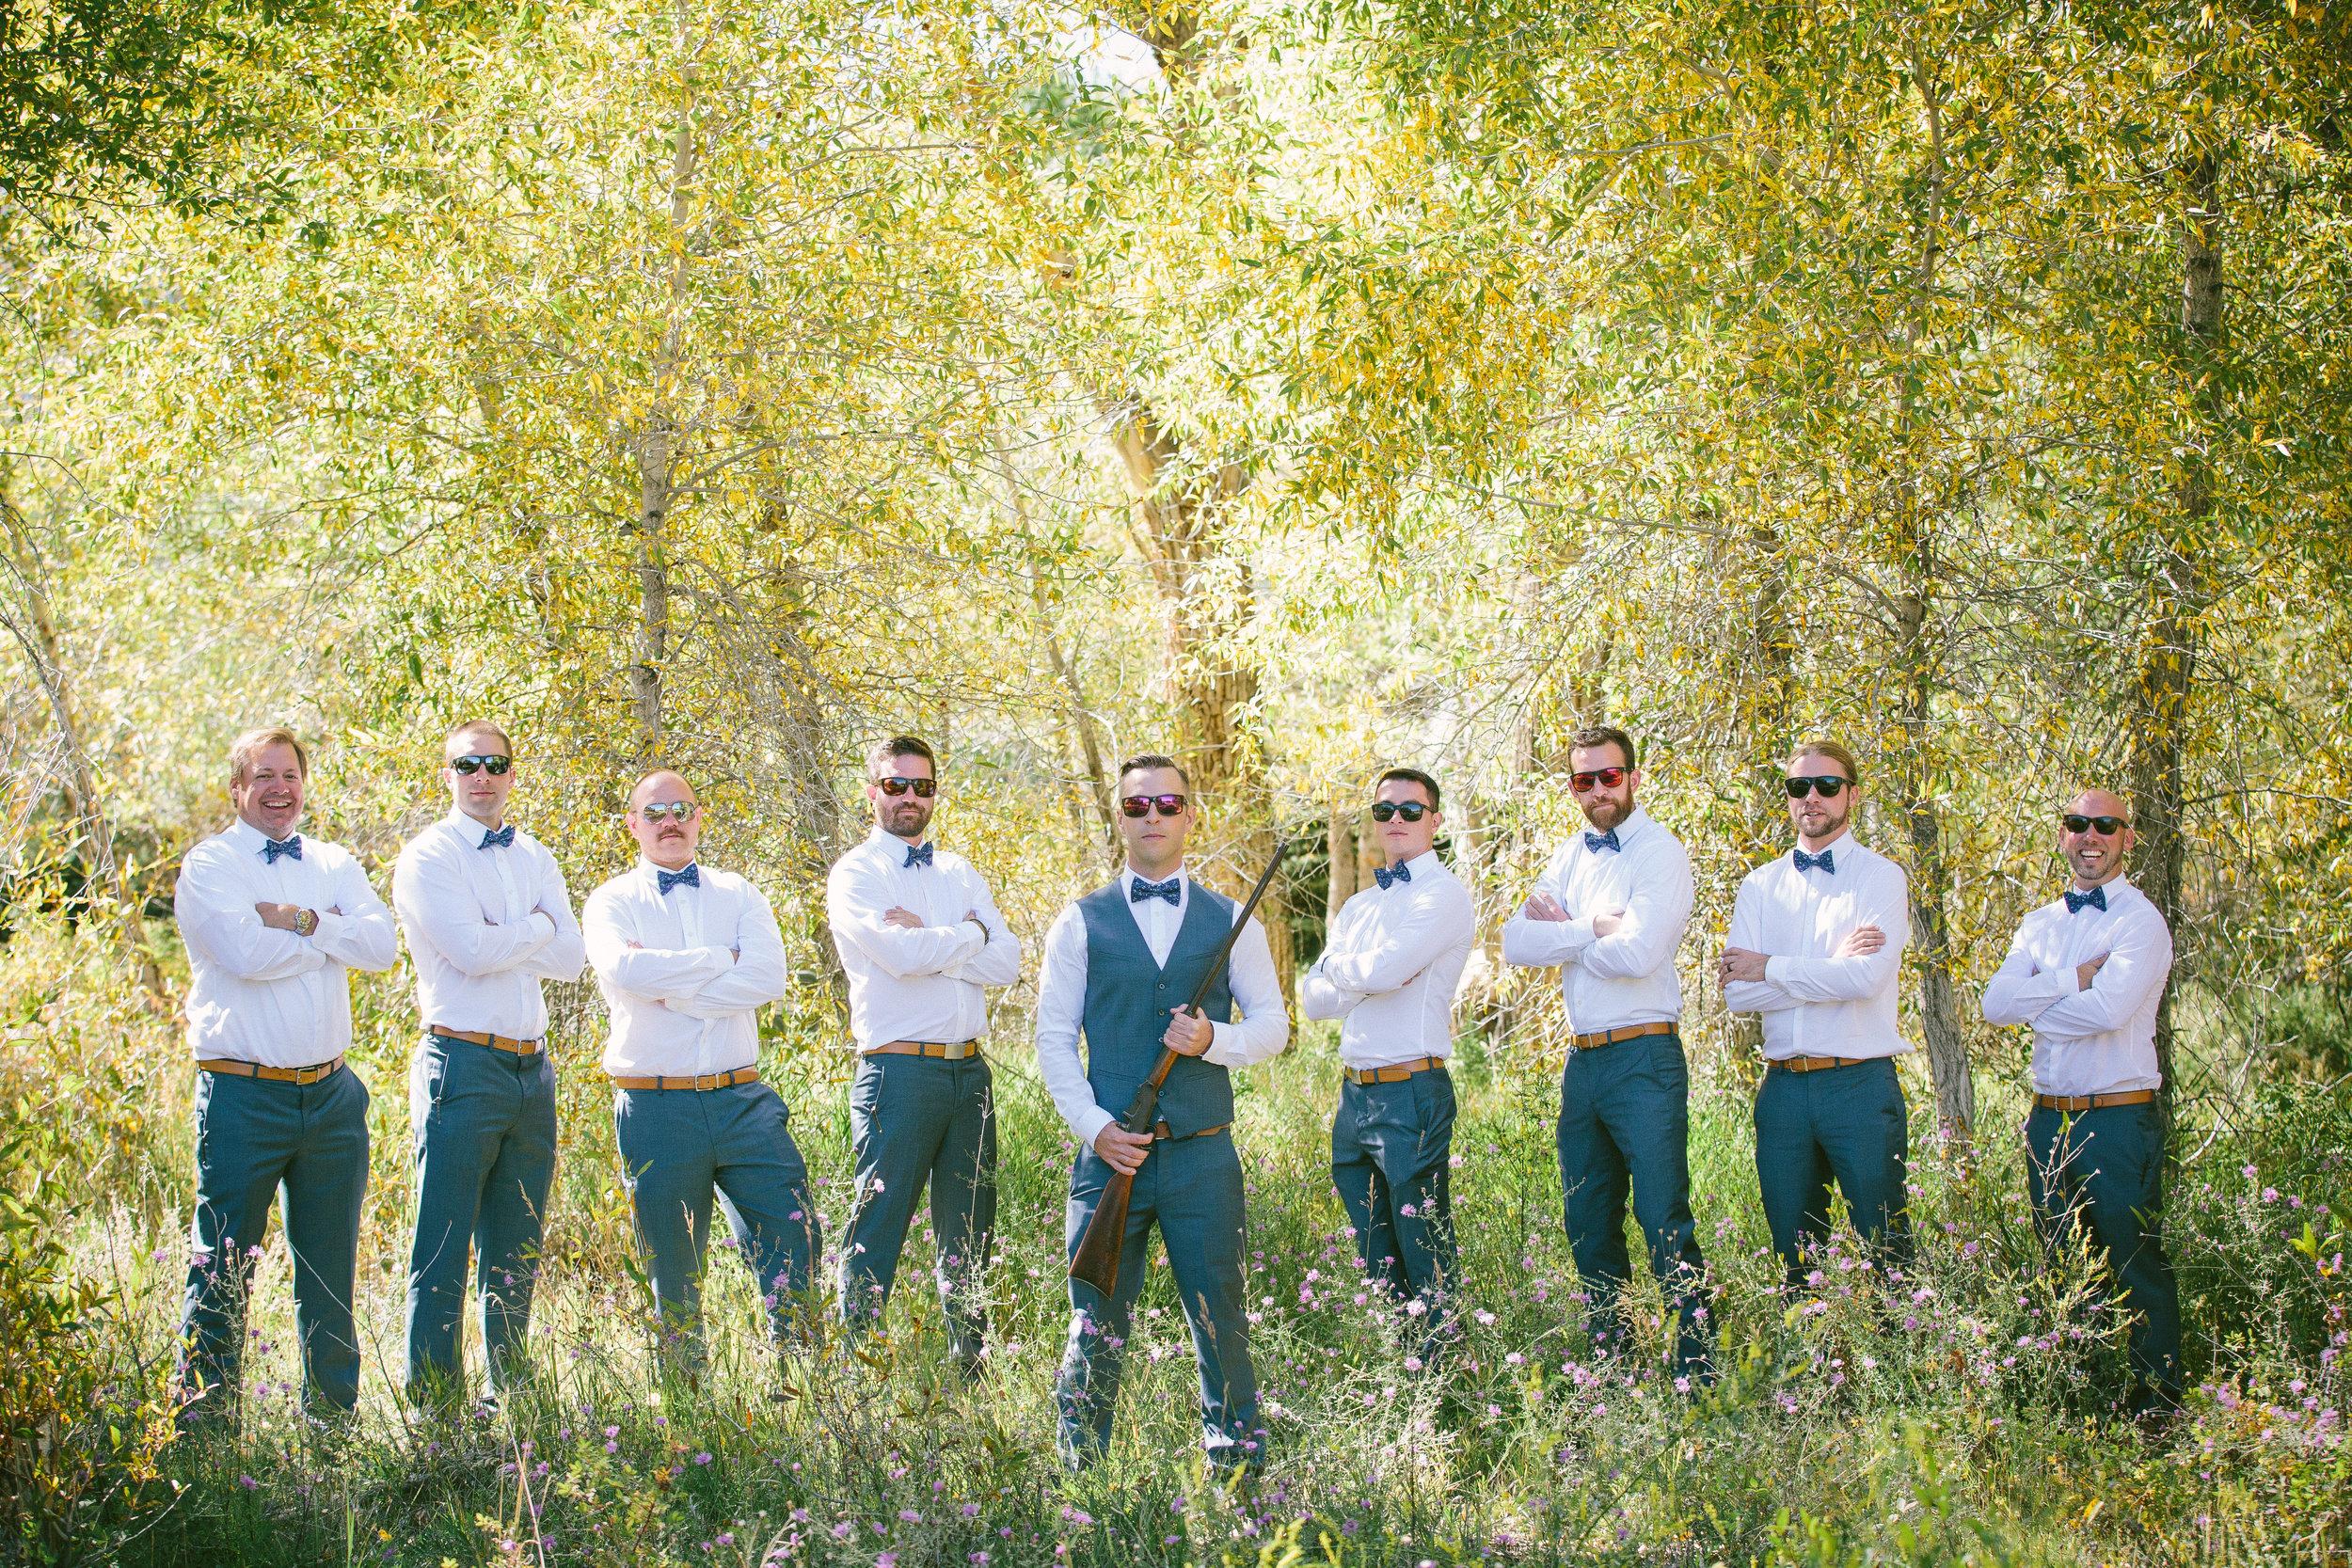 MP_Sam & Alex Wedding-Buena Vista-Quick Edit-3575-web.jpg